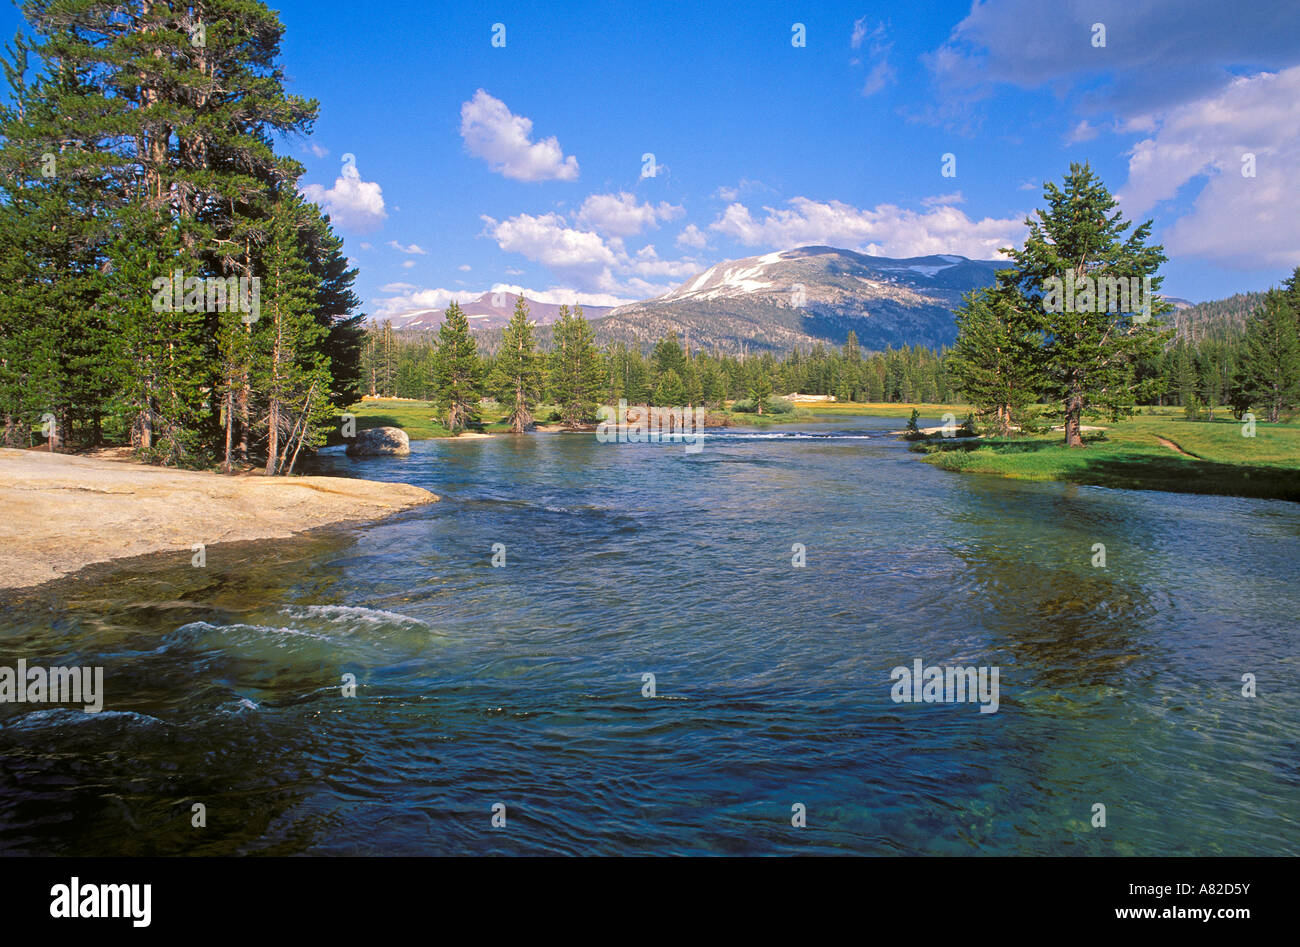 The Lyell Fork of the Tuolumne River Tuolumne Meadows area Yosemite National Park California Stock Photo